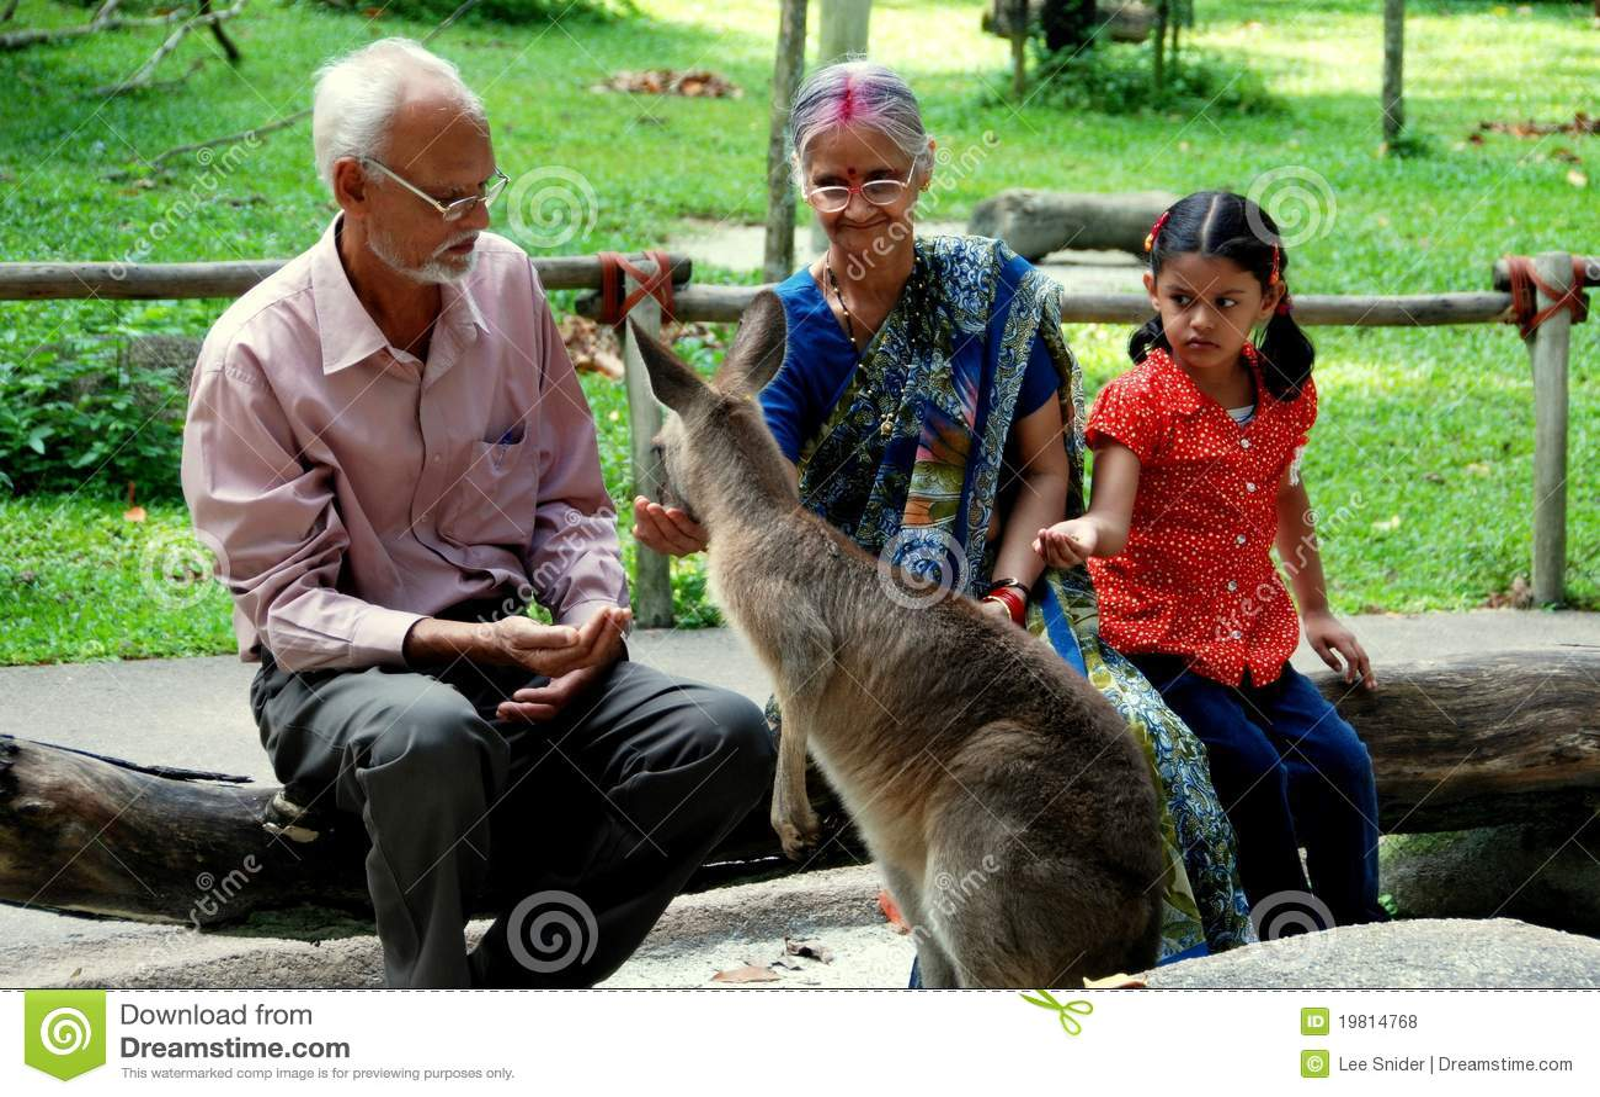 Singapore Indian Family Feeding Kangaroo Editorial Stock